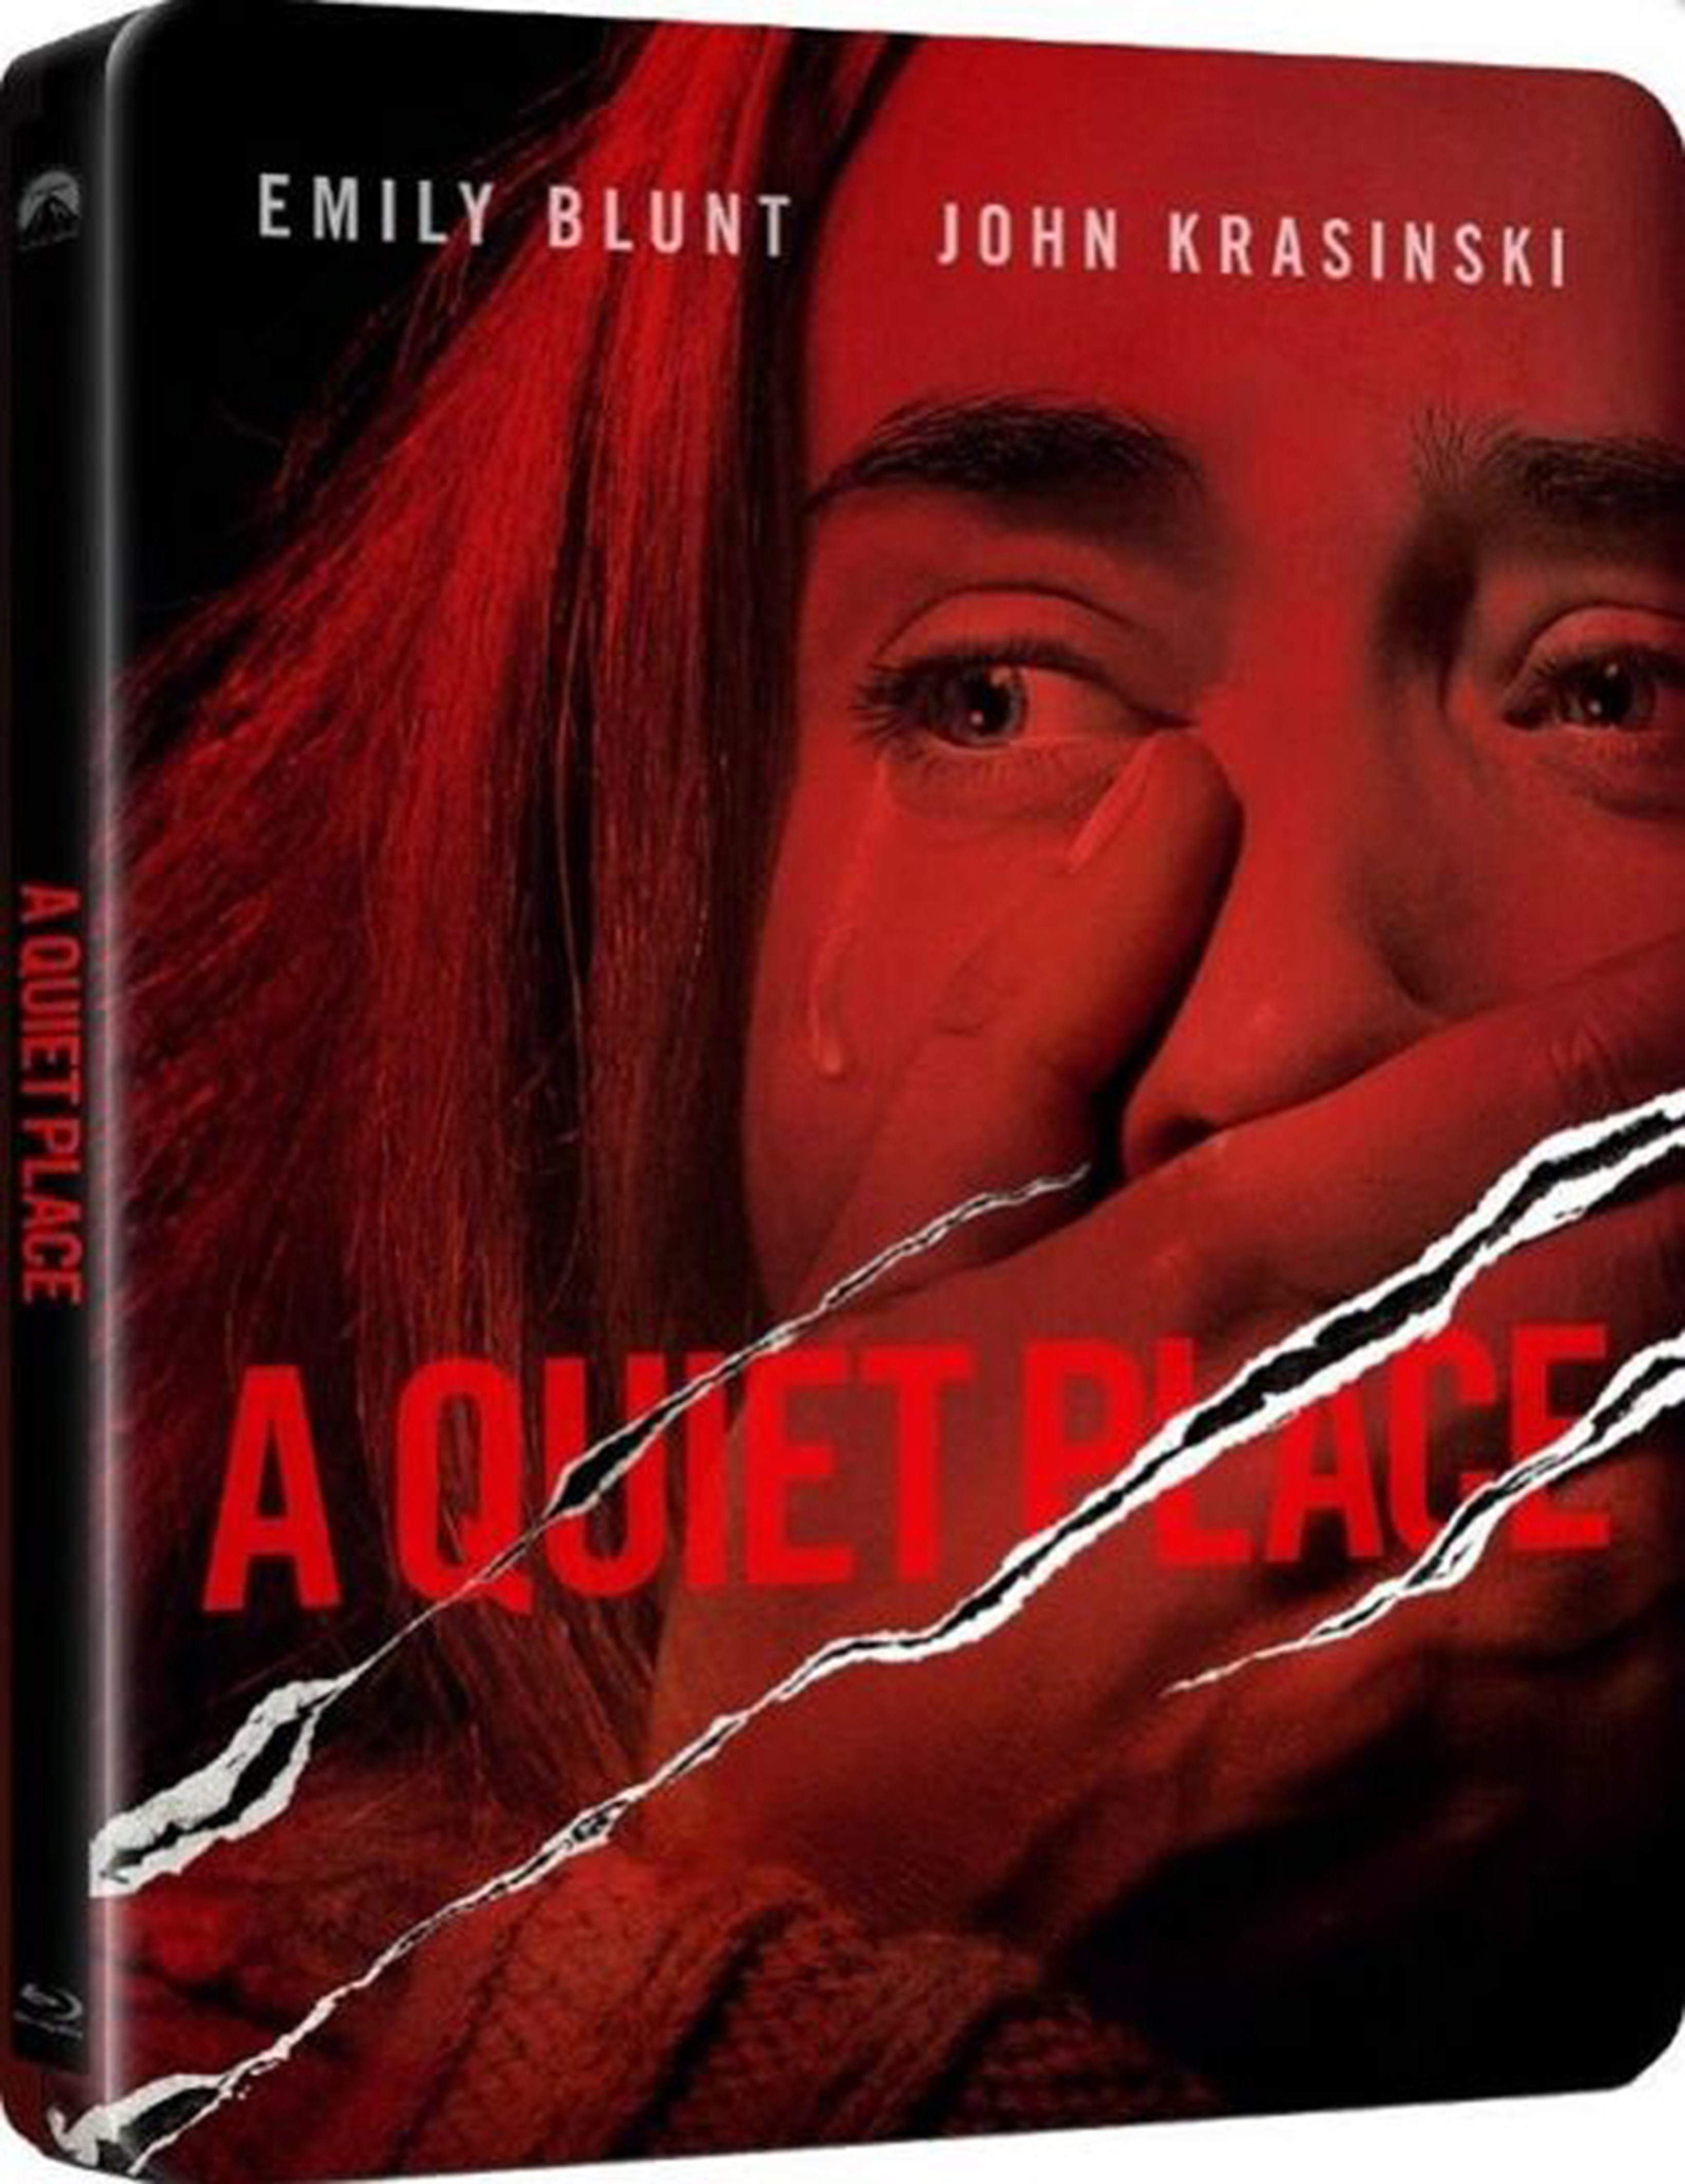 A Quiet Place (hmv Exclusive) Limited Edition Steelbook - 1